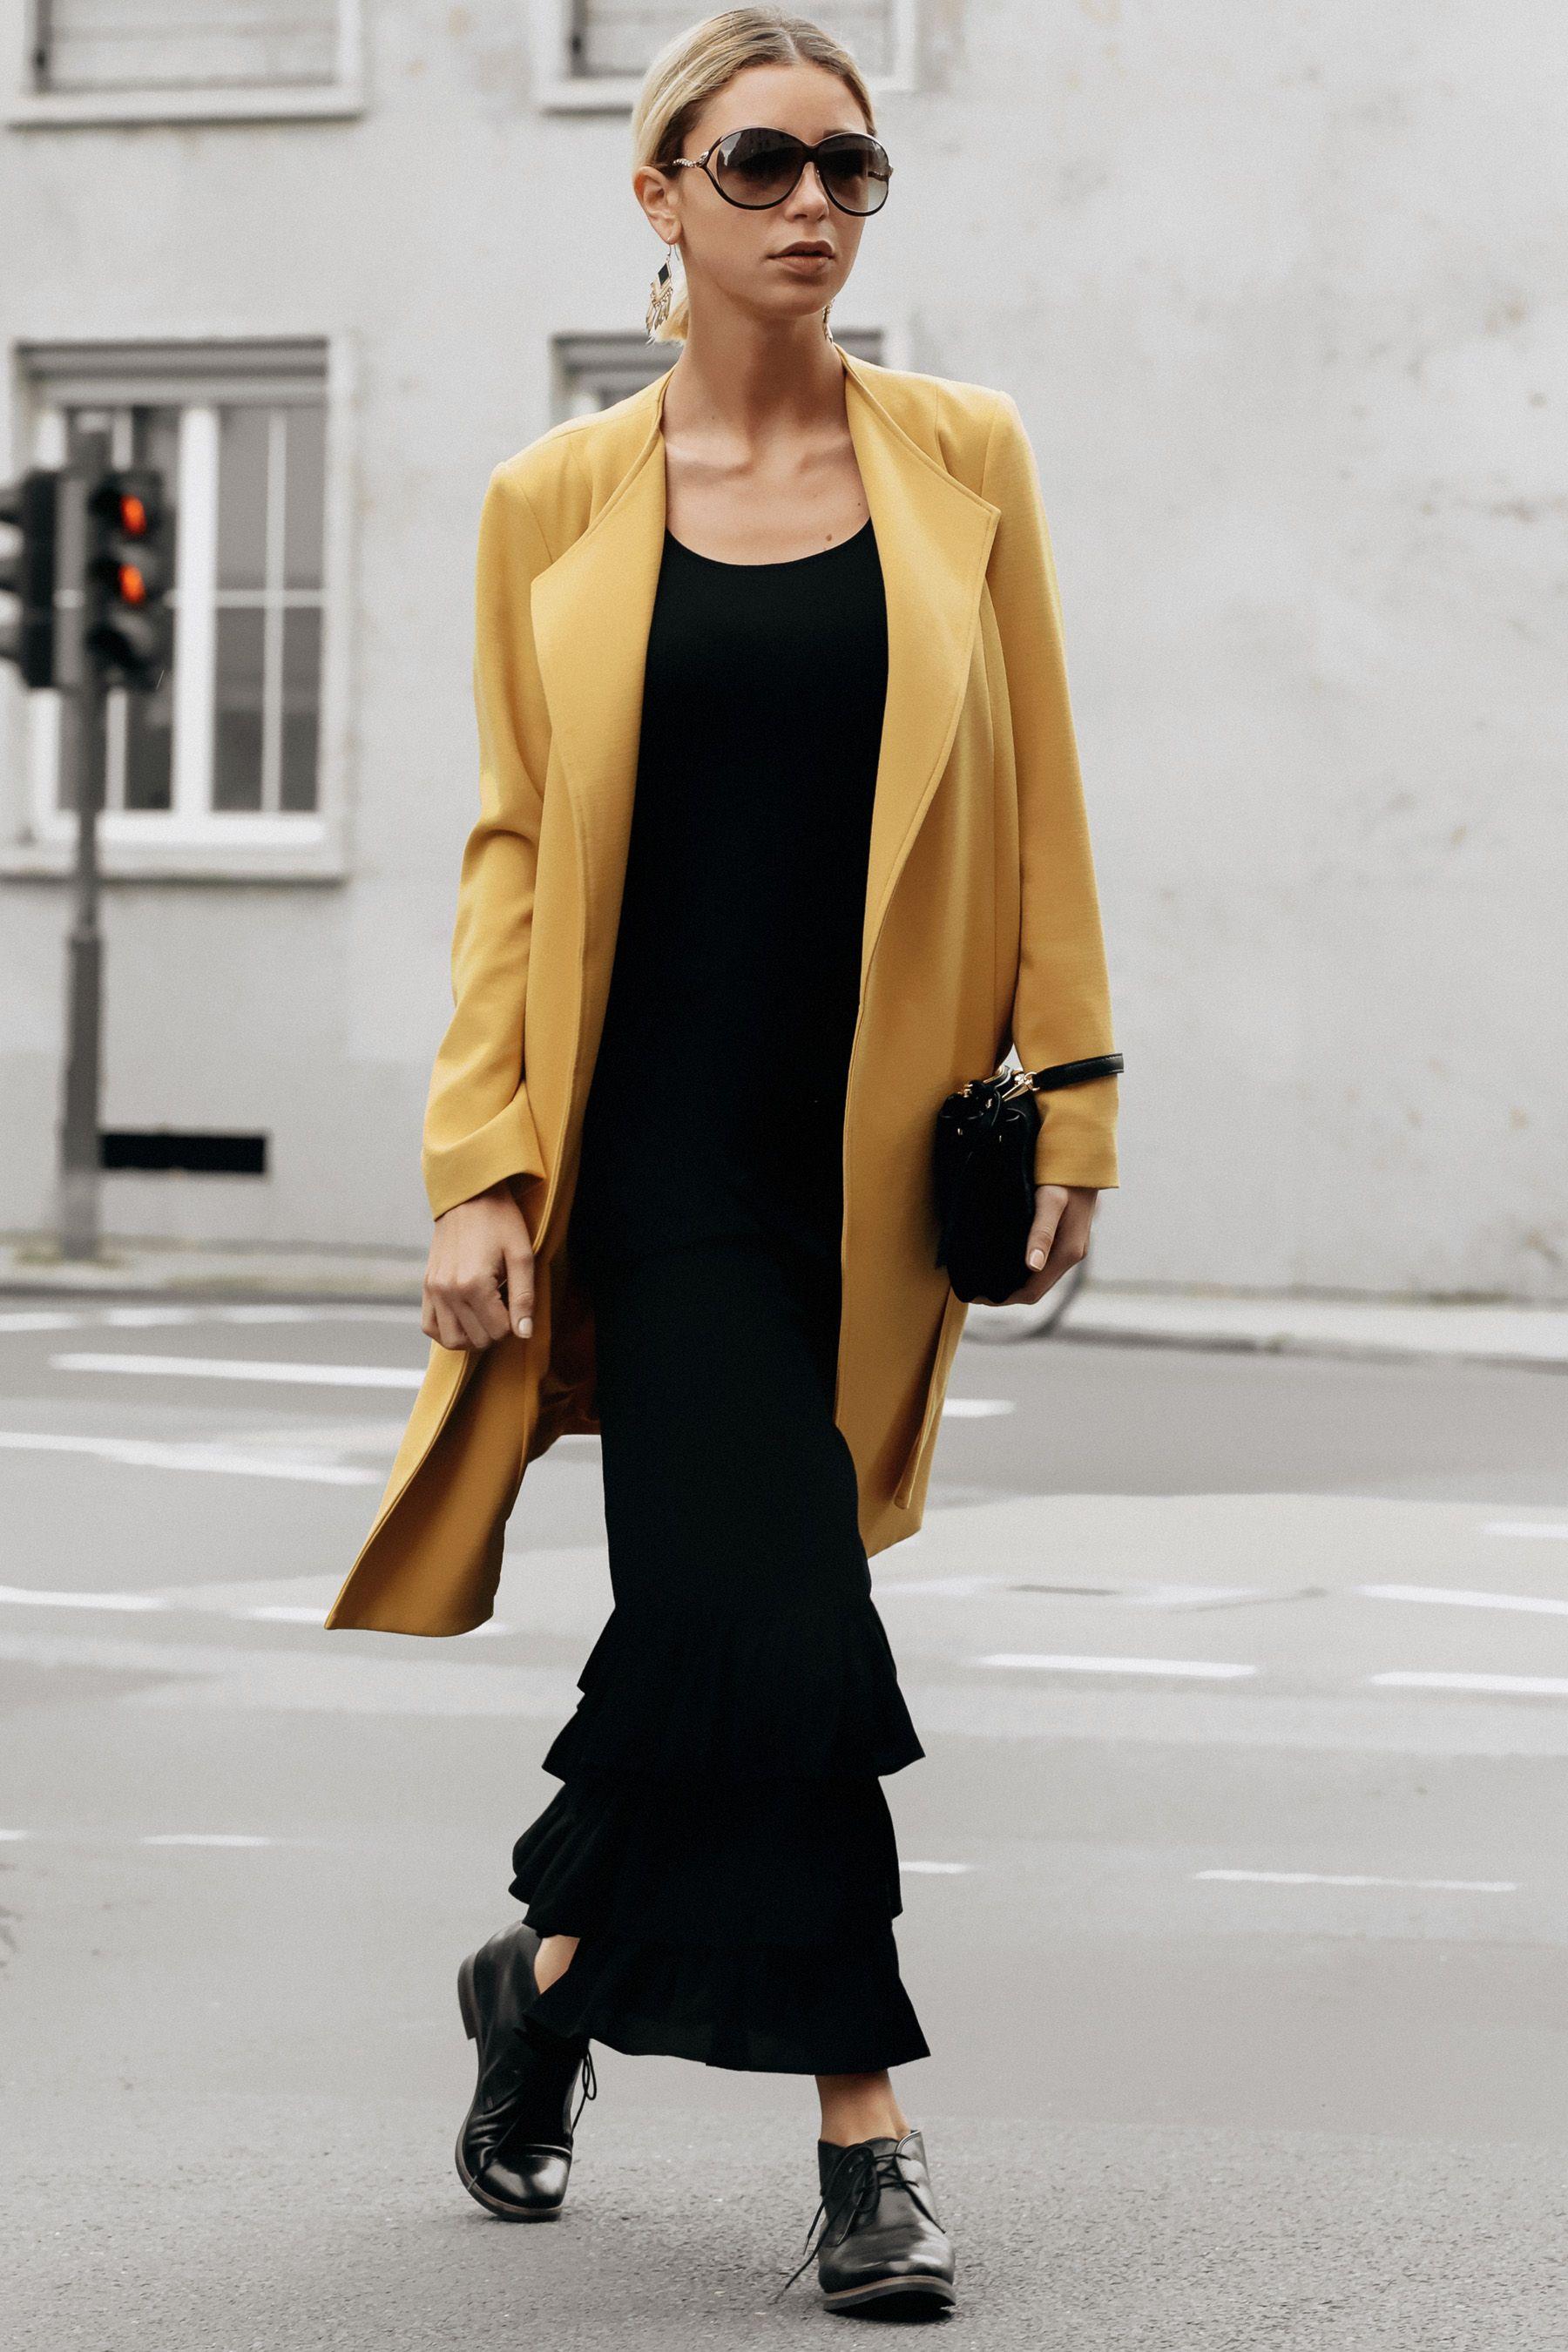 Between the seasons: 7 Outfit Ideen für den gelben Mantel